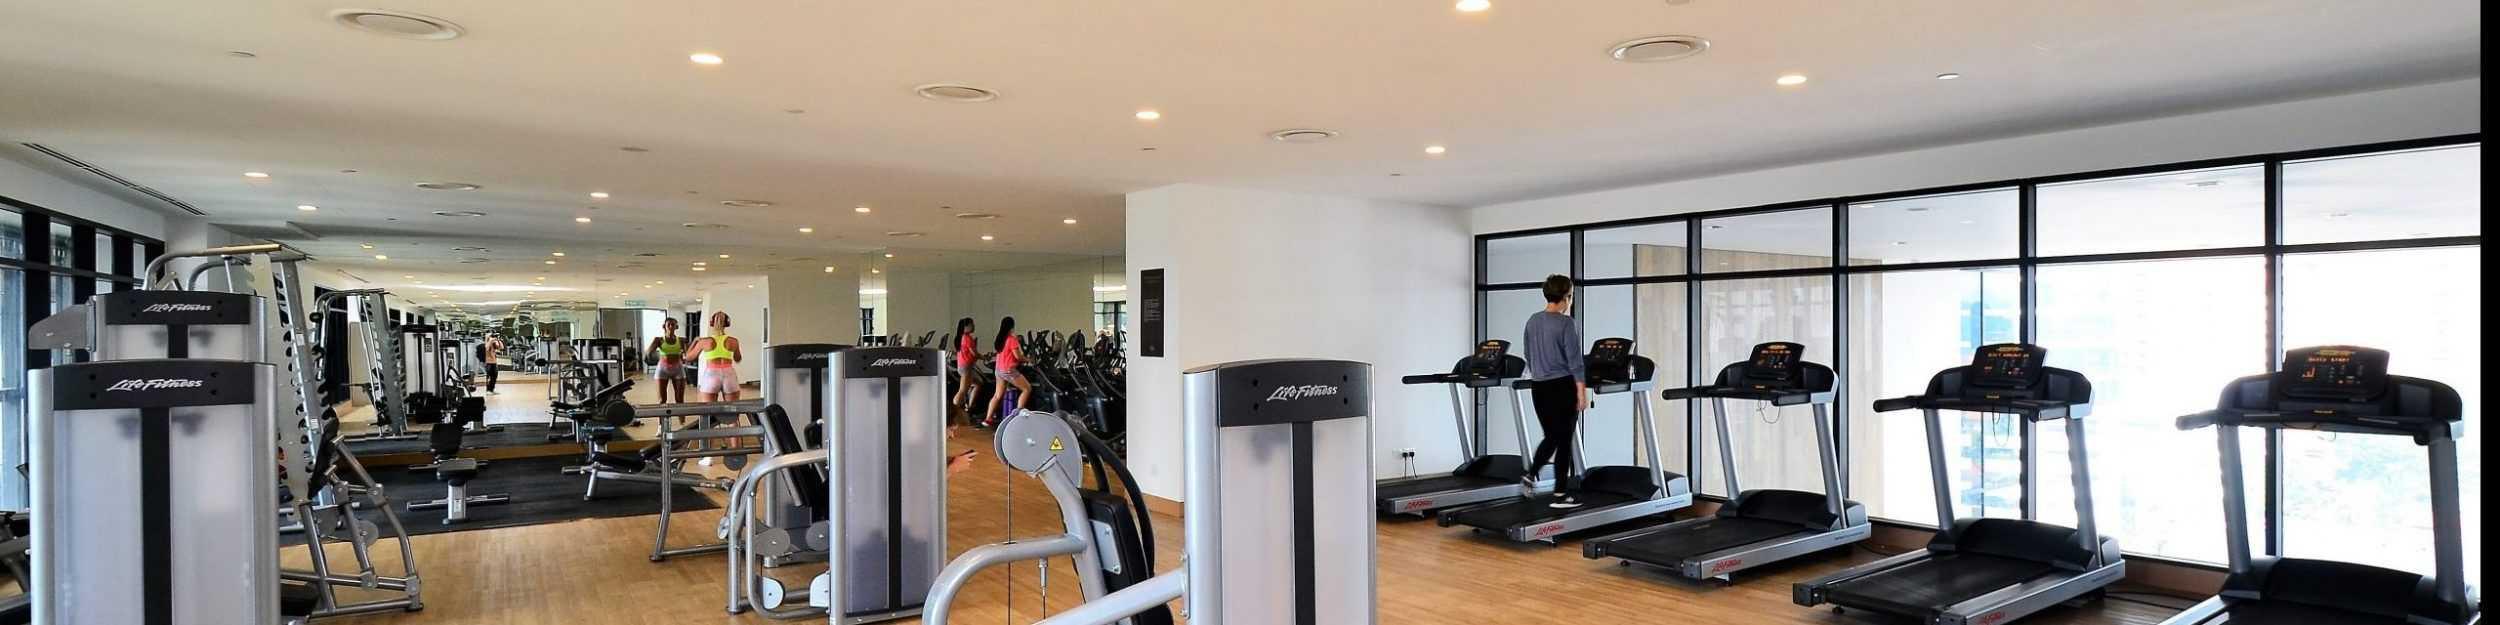 Your Gym Zone